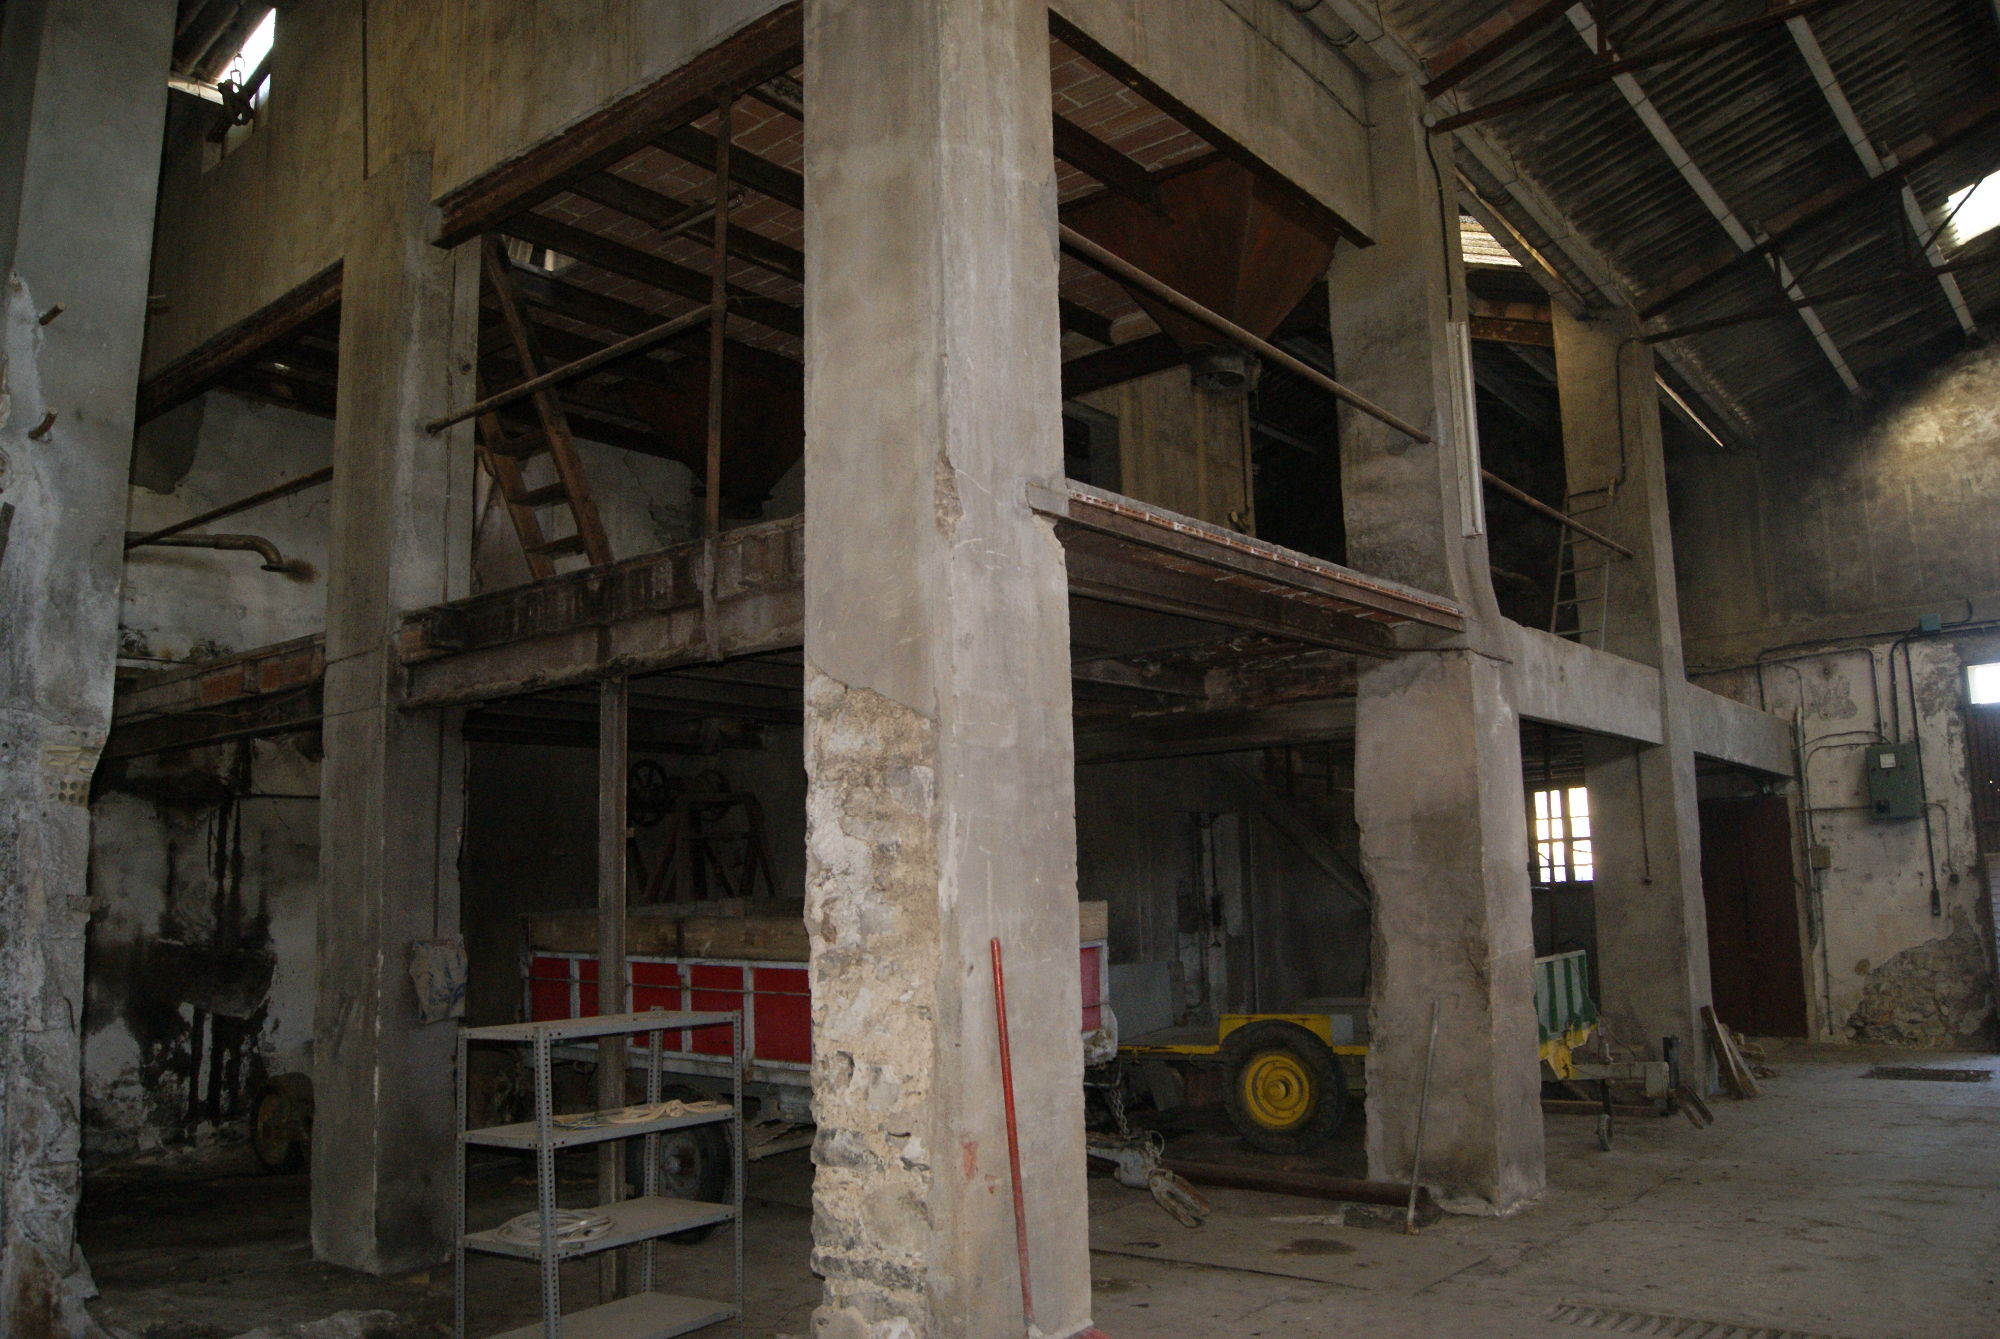 gandesa,Fabrica i Magatzem,gandesa,1015